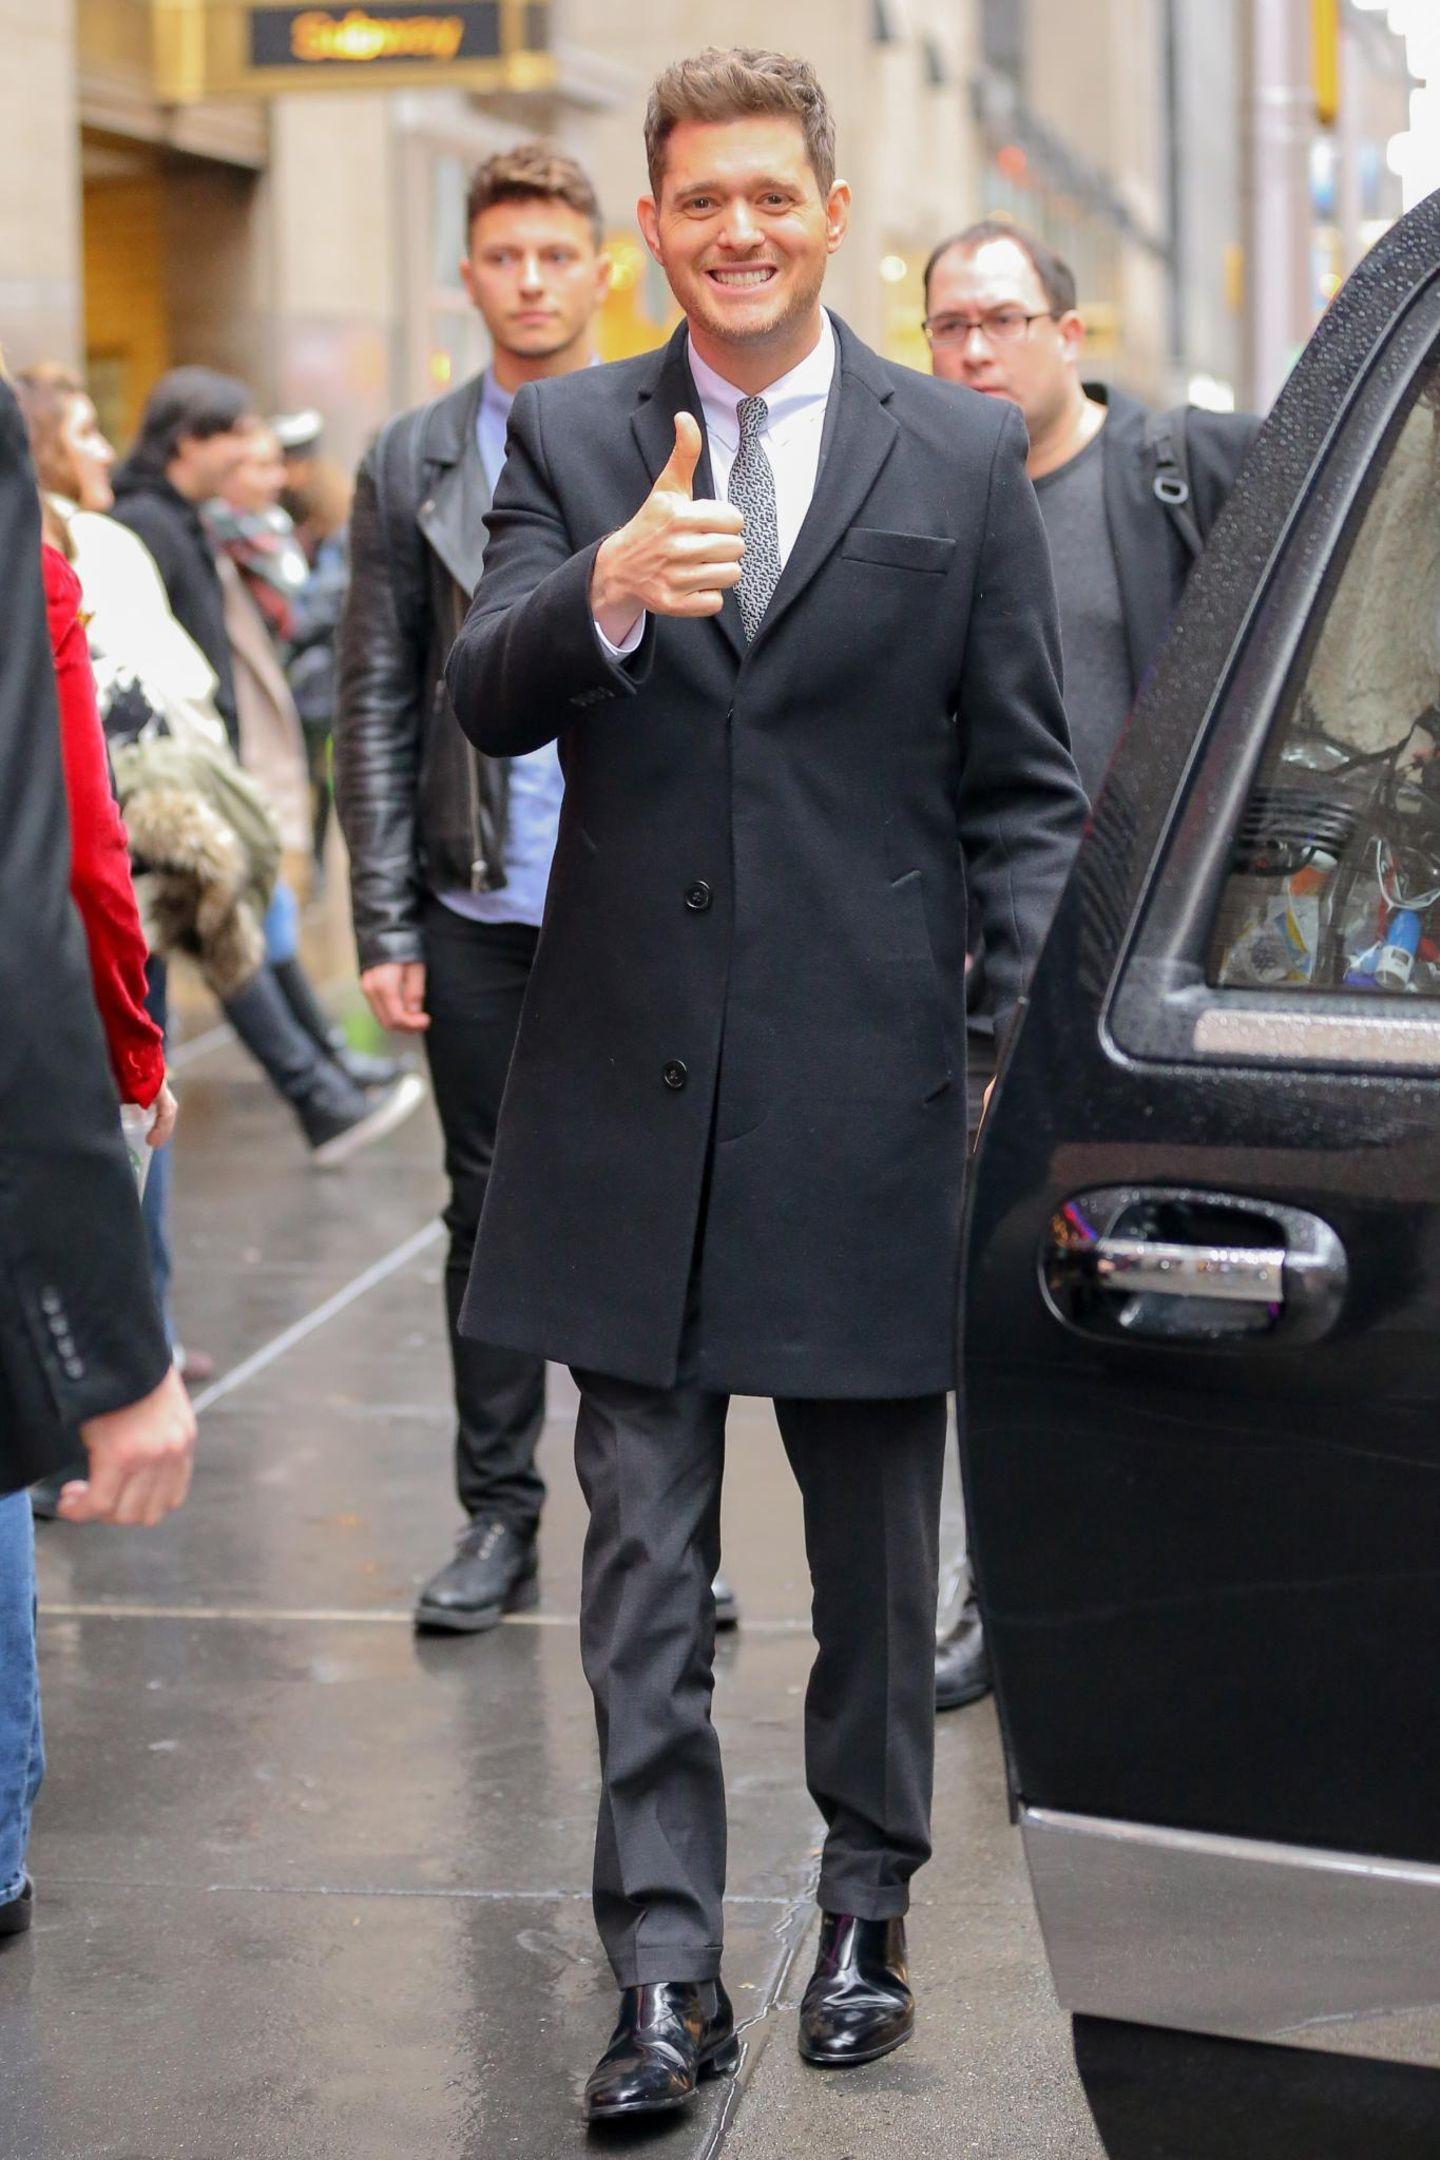 1. Dezember 2015: Michael Bublé ist bestens gelaunt in Midtown Manhattan untrwegs.